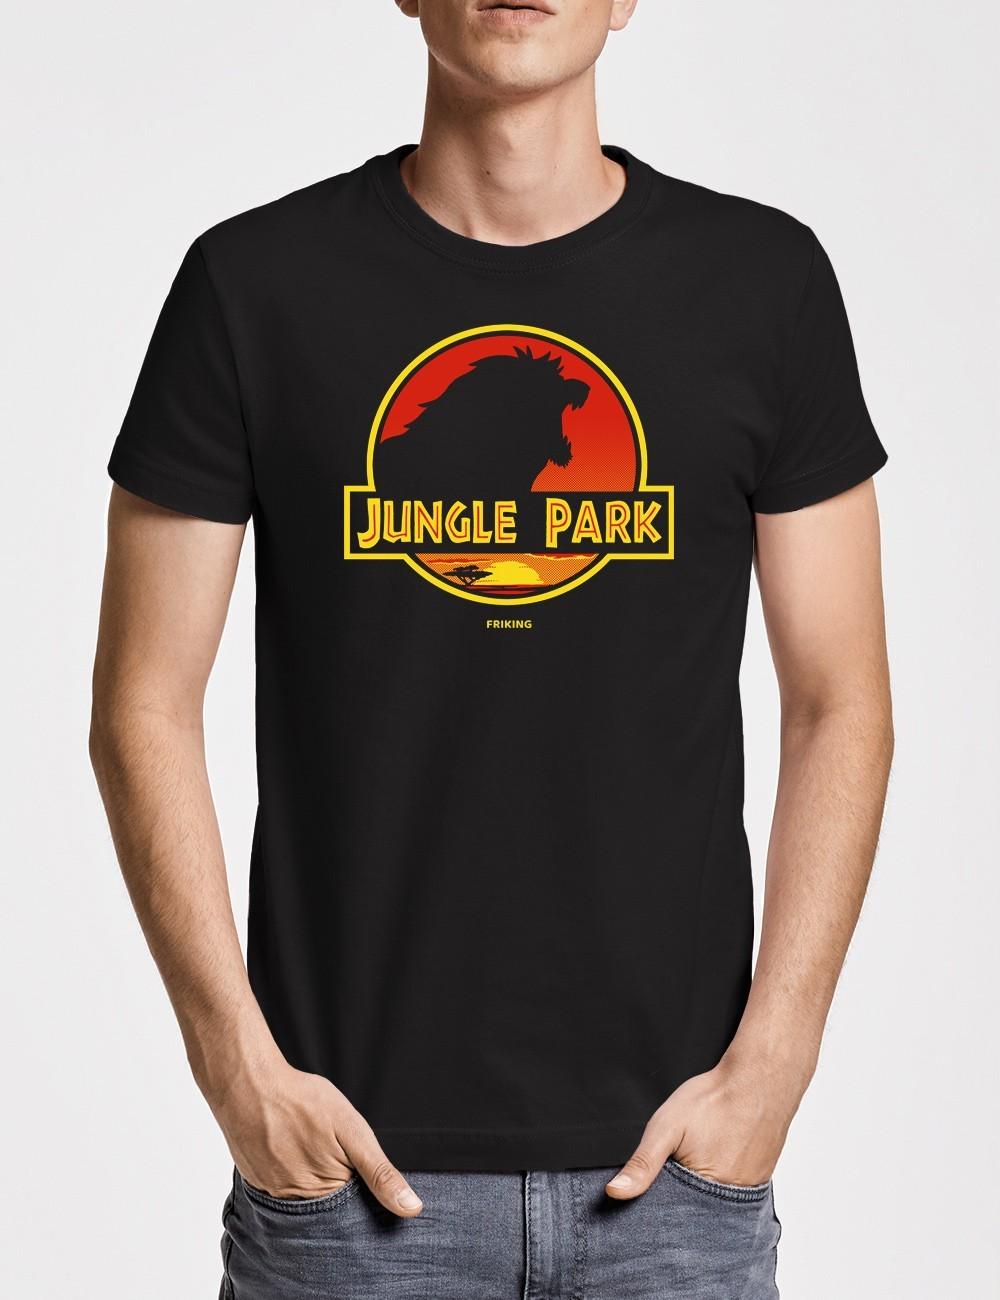 Jungle Park